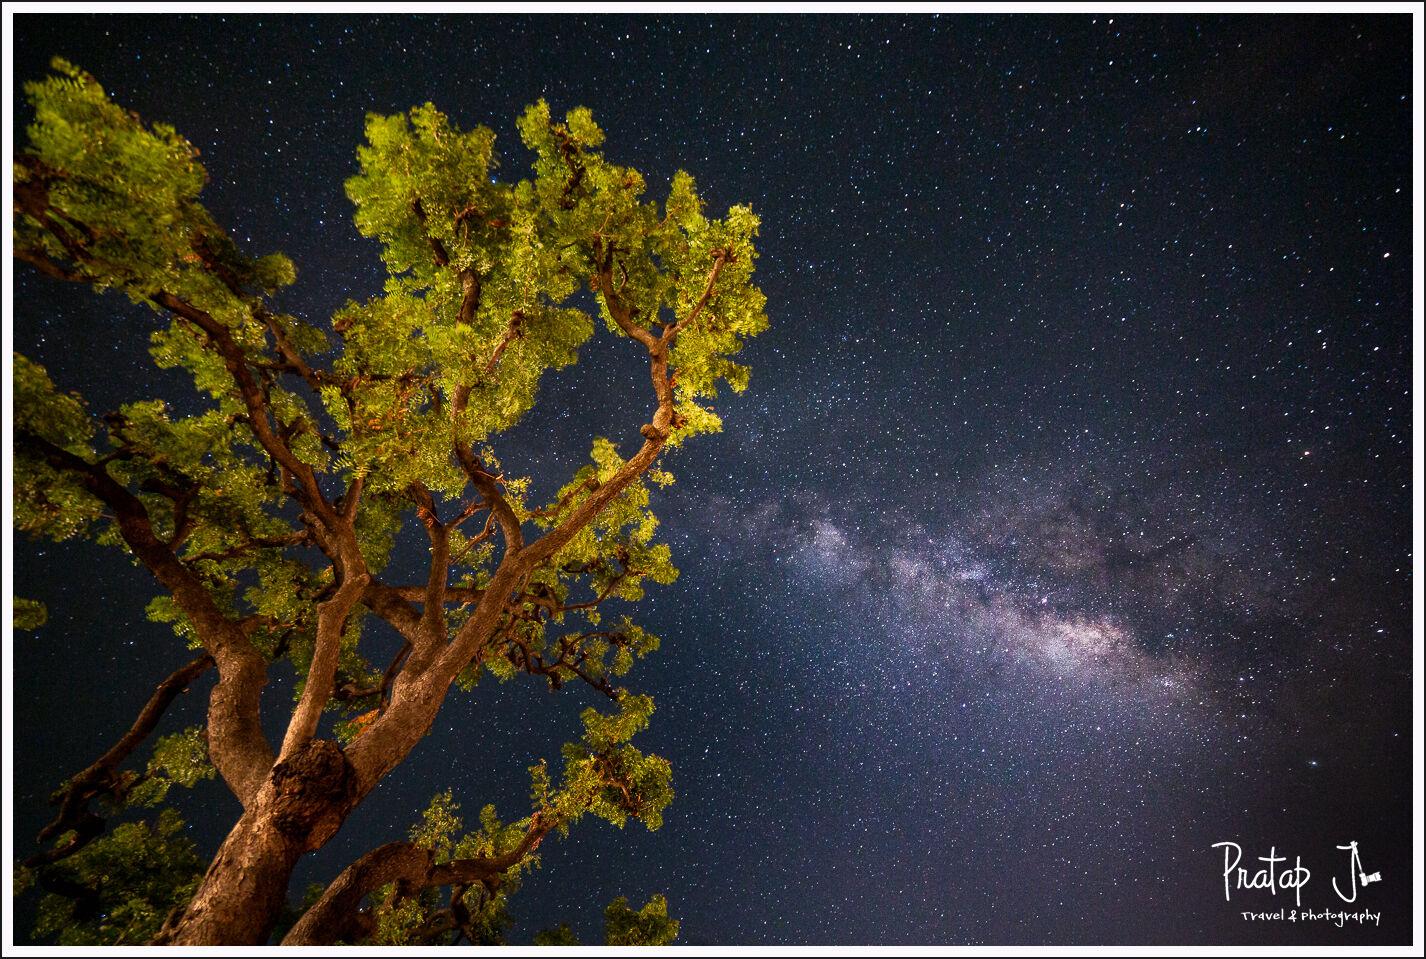 Milky Way in the night sky in Badami, Karnataka